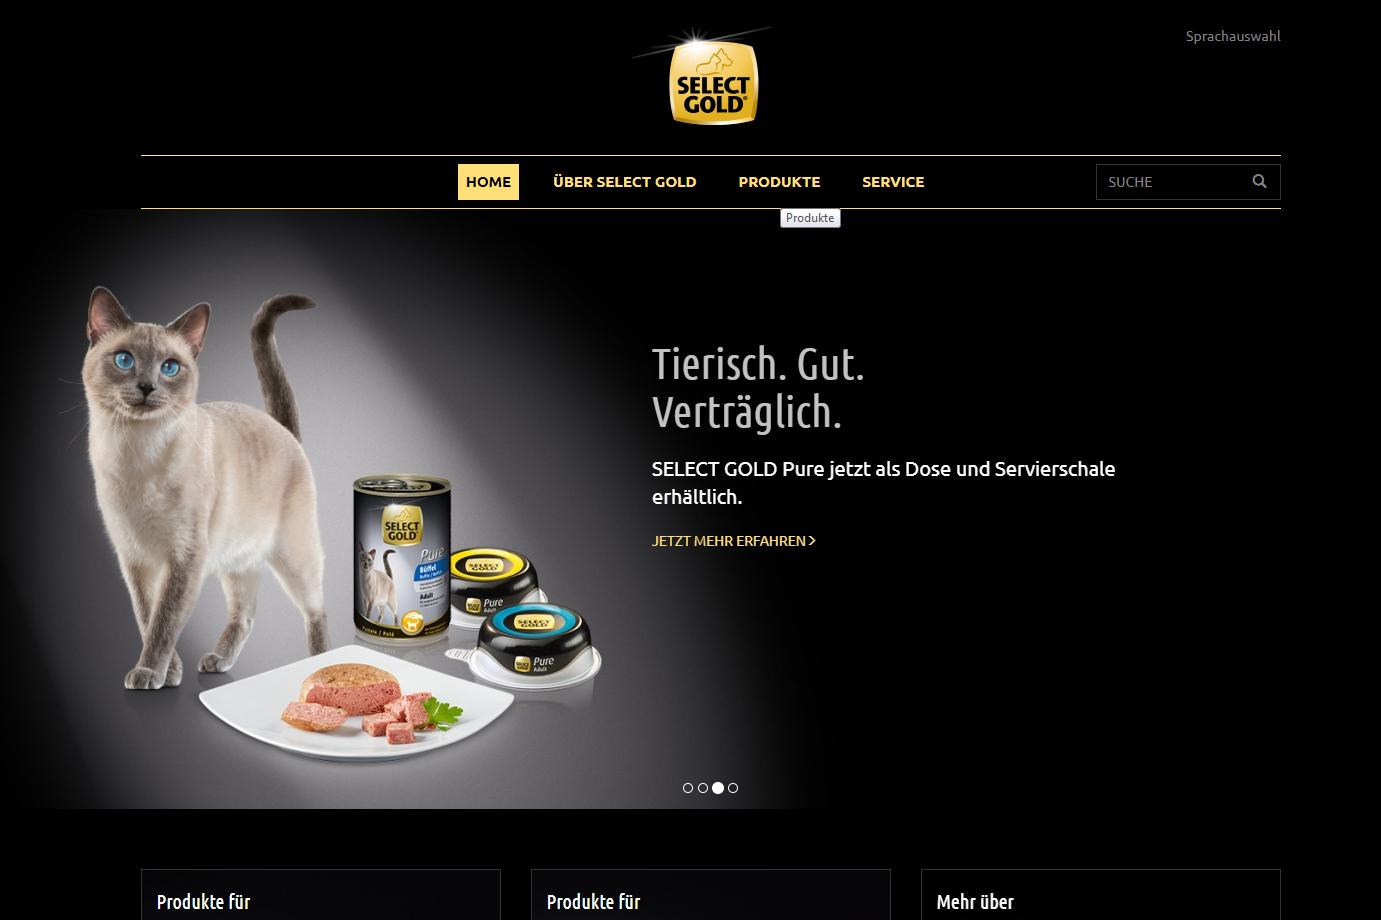 Fensterkatzen_Getestet_Select-Gold-Fressnapf_Screenschot-Homepage